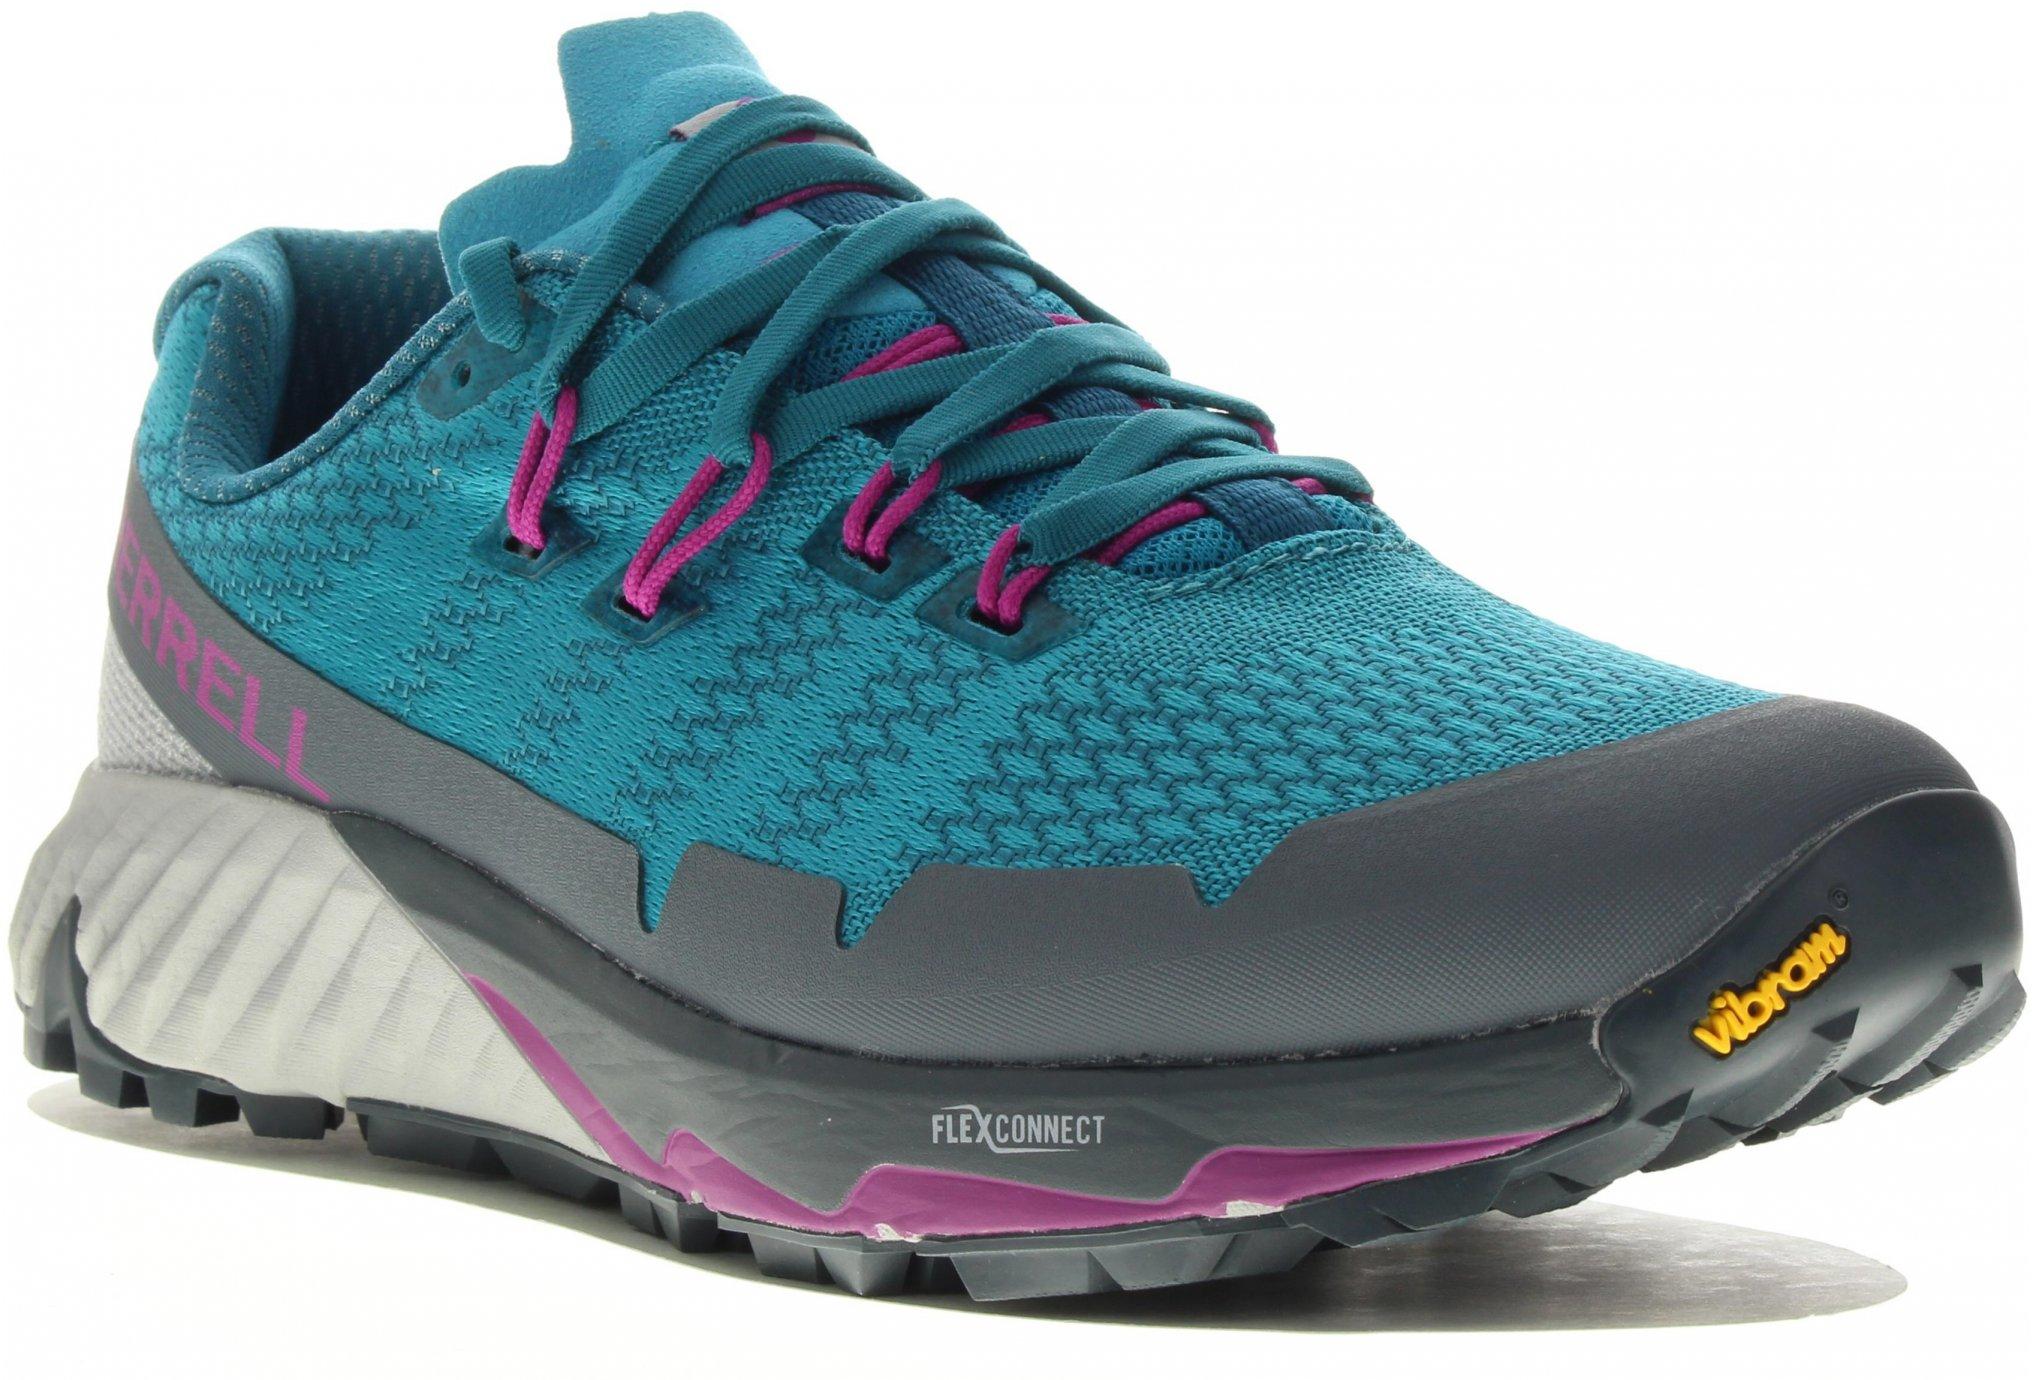 Running W Merrell Peak Femme Flex Agility Chaussures 3 Trails 4R35jcLqSA